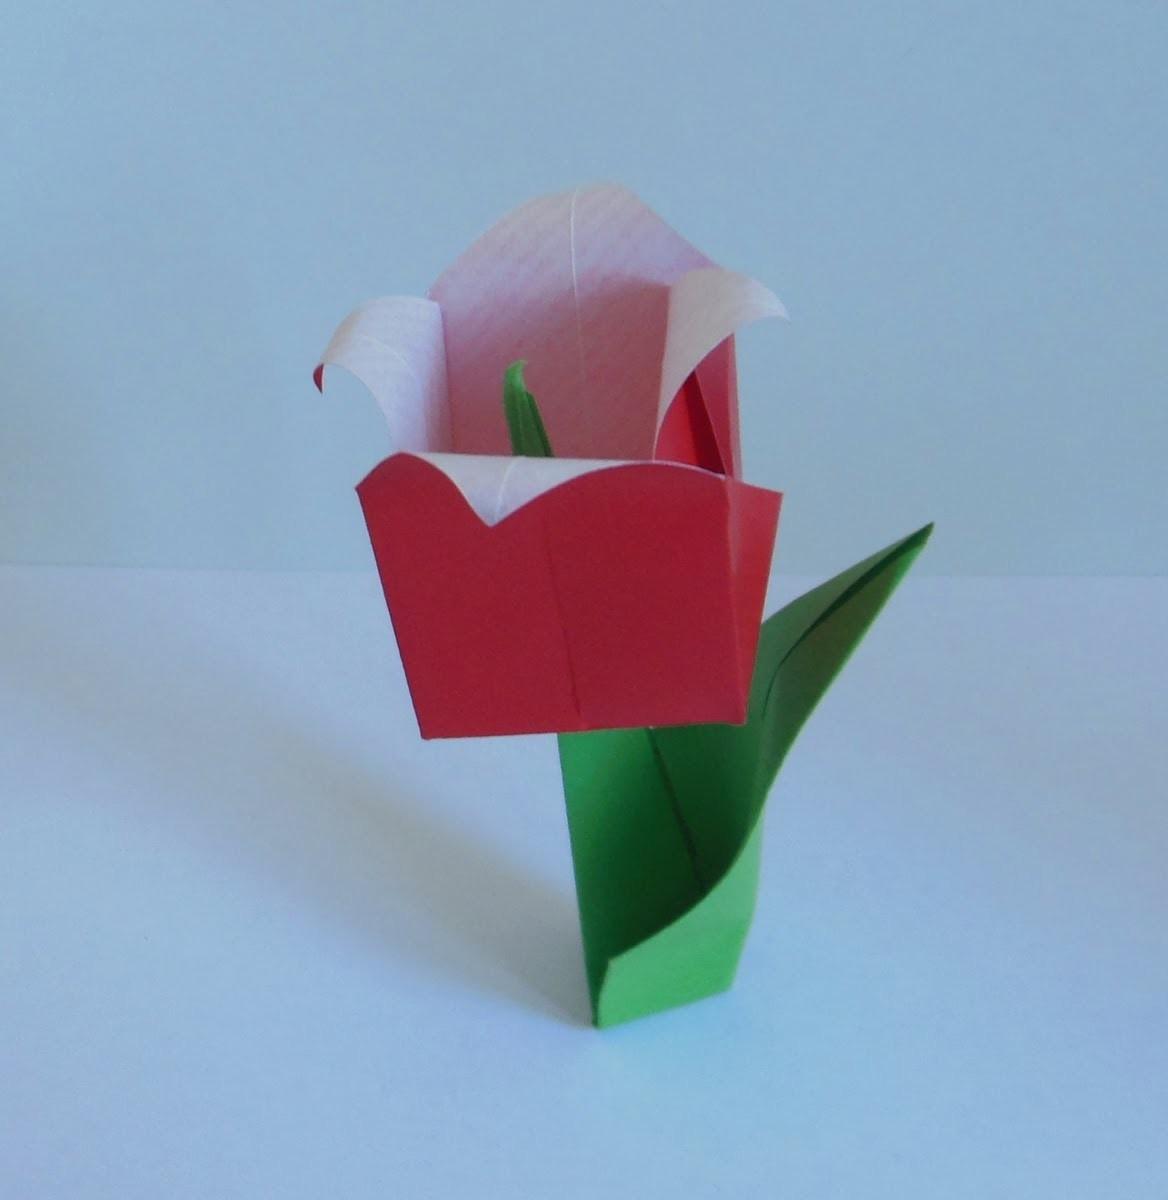 Origami-Tulpe mit Blatt